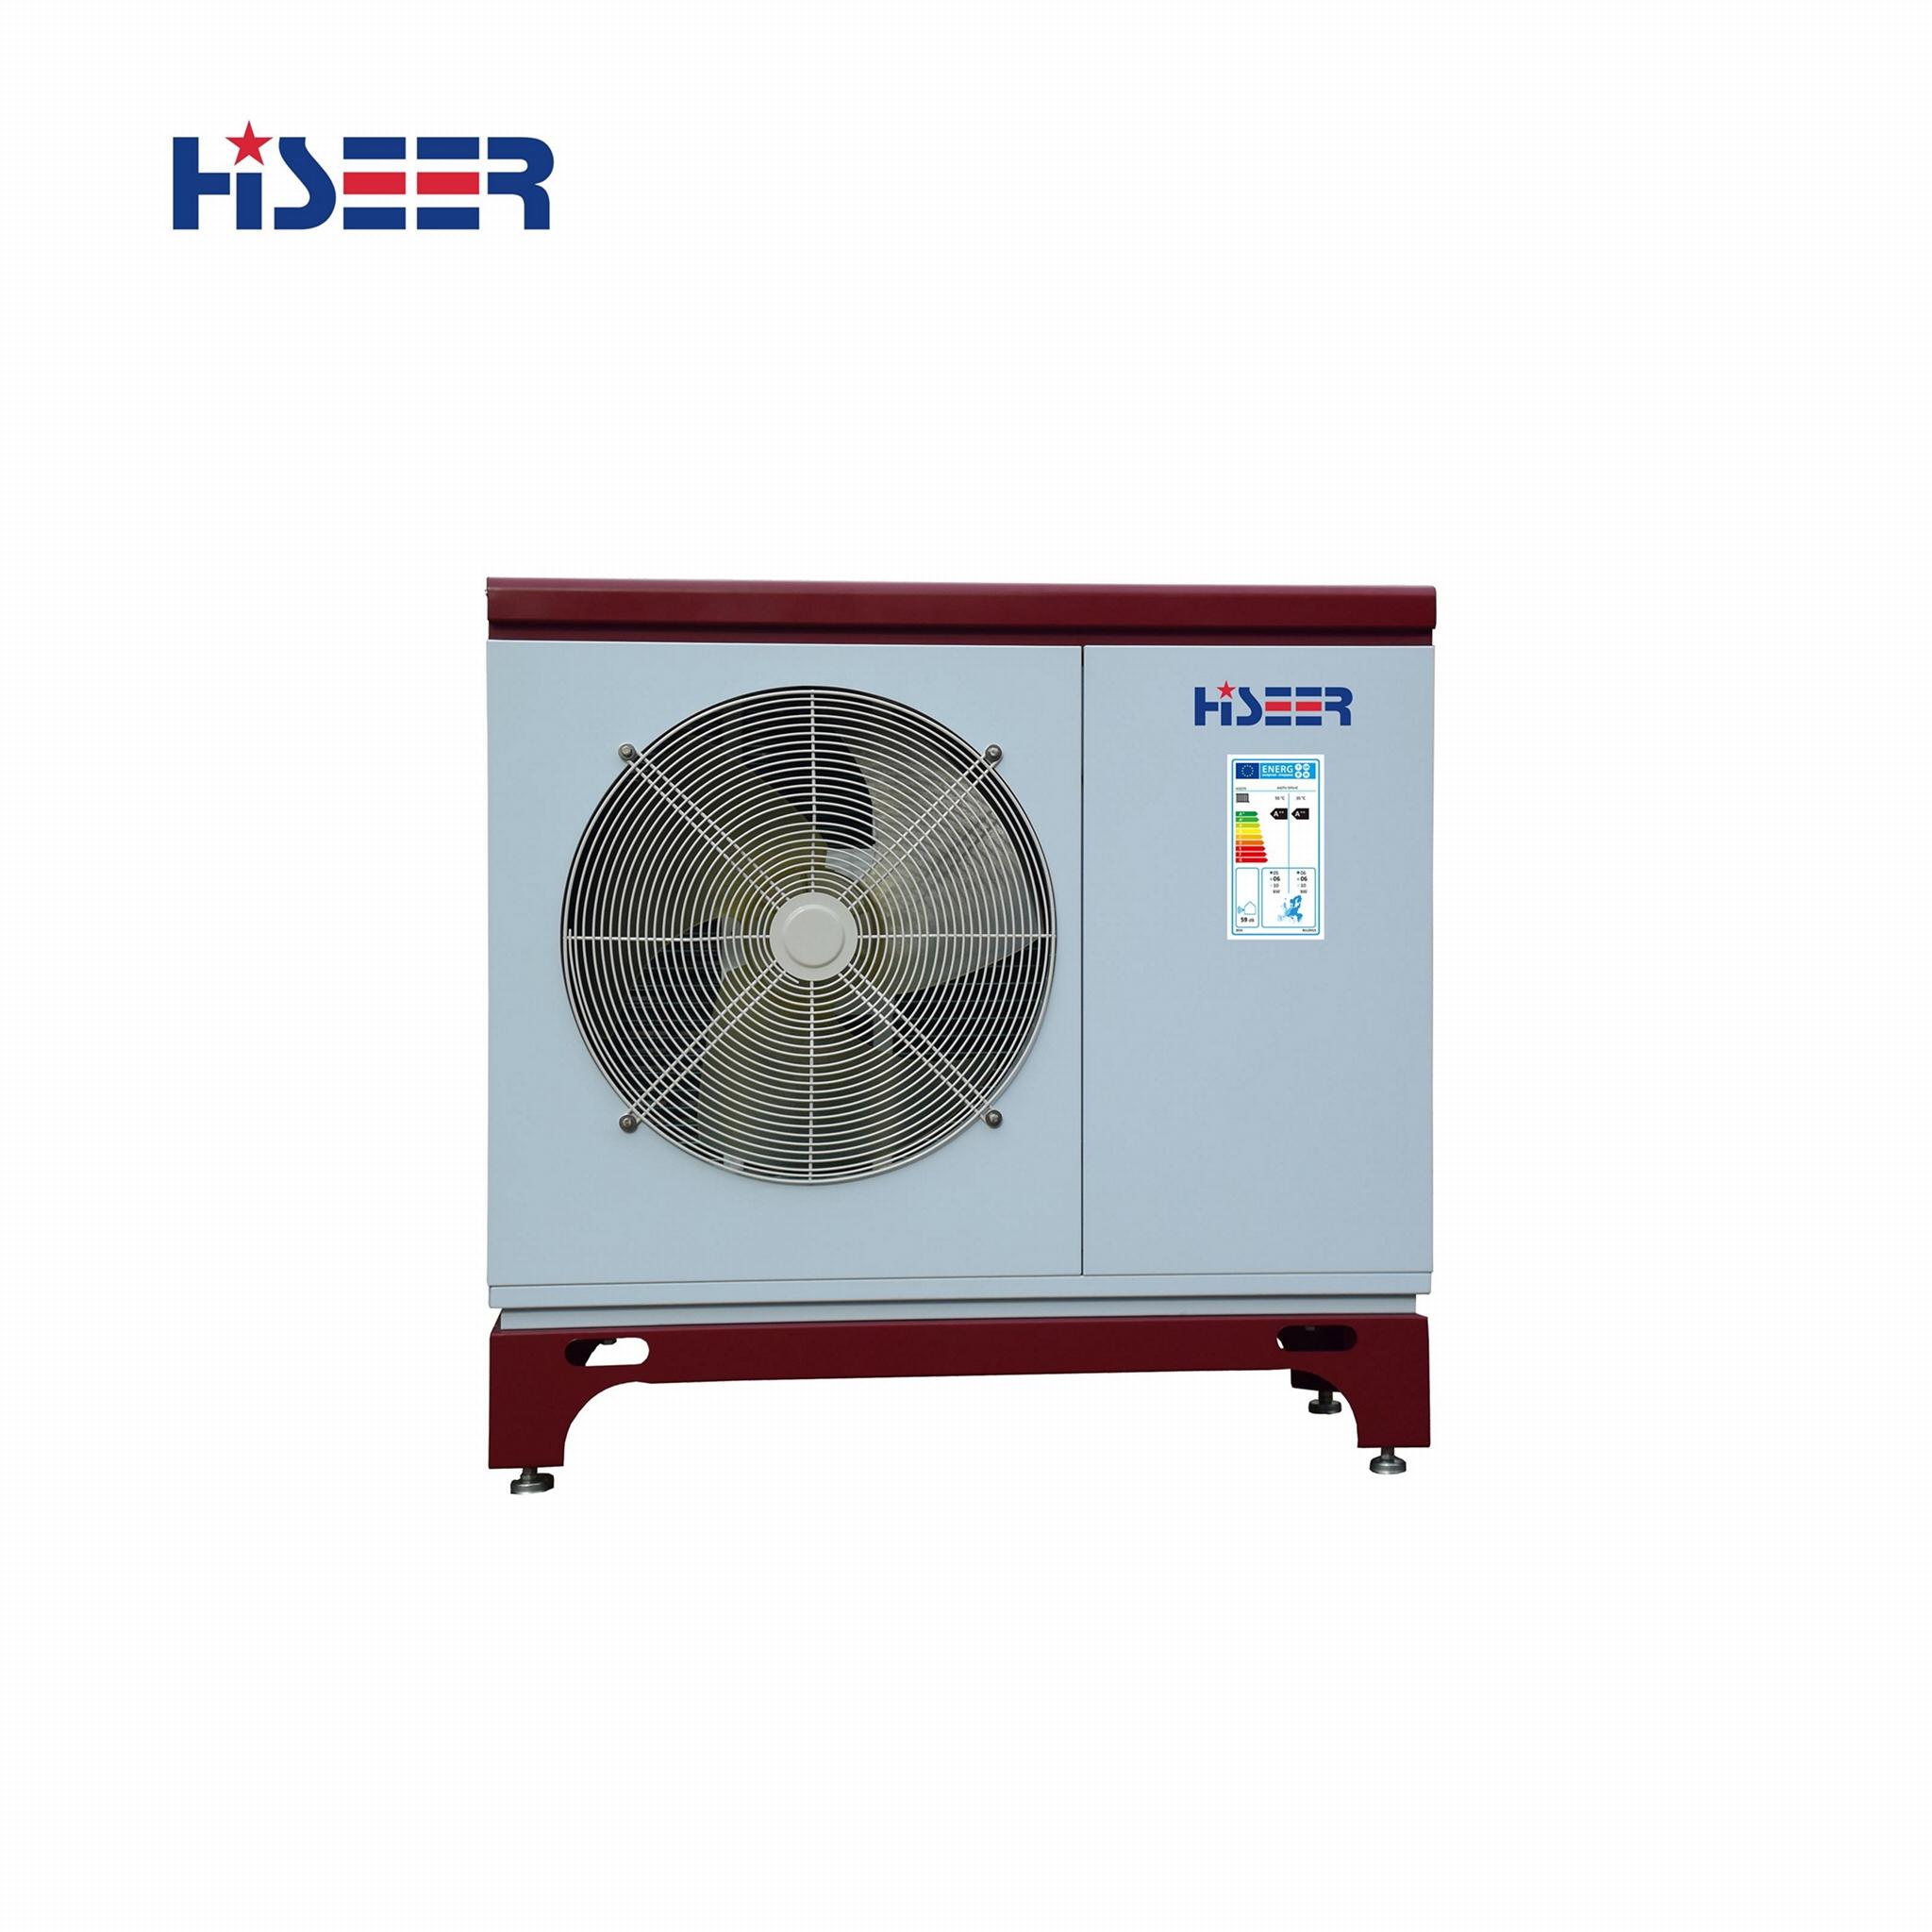 R32 heat pump RS07V